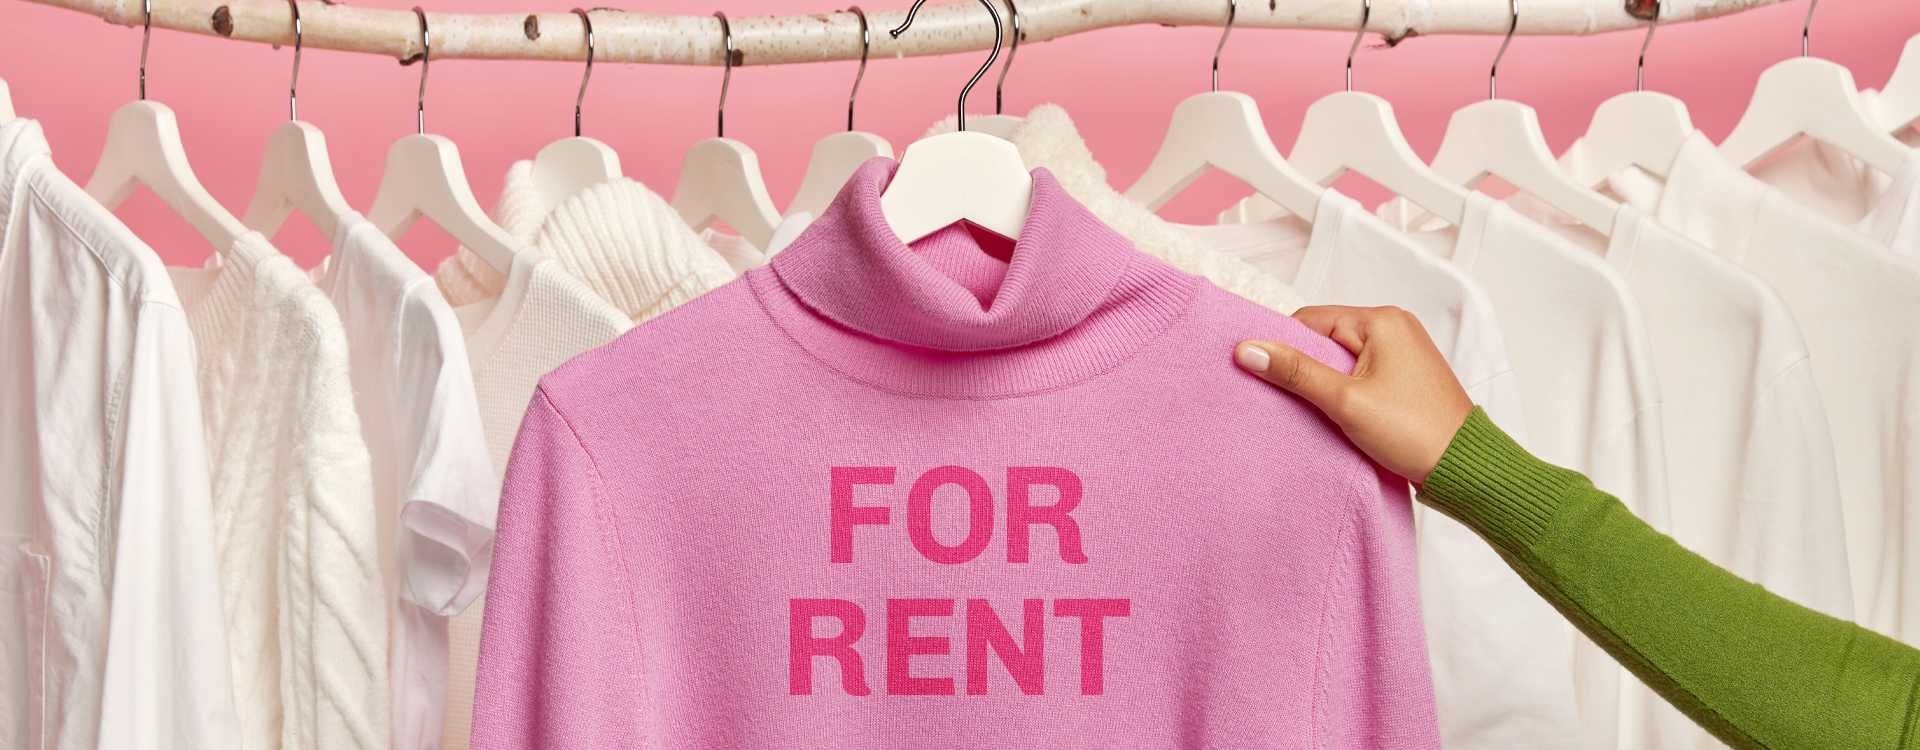 Cloths on Rent